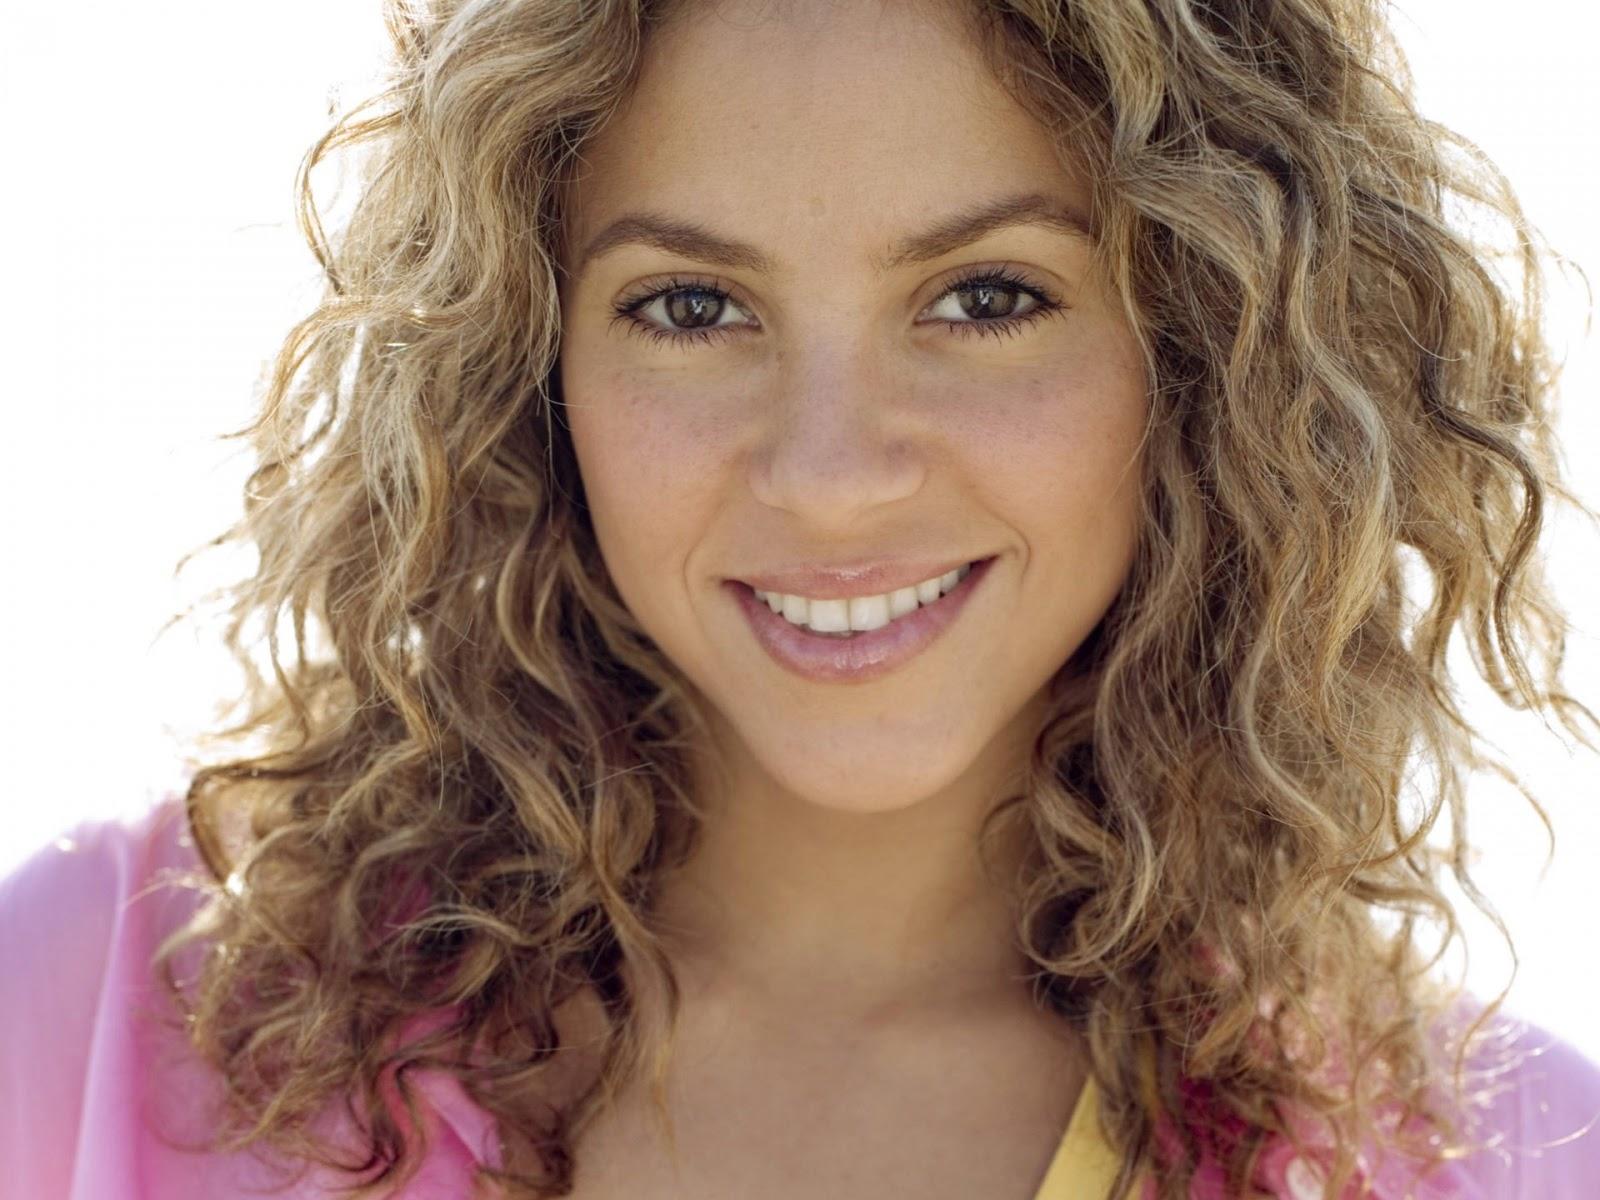 Shakira Hot Colombian Singer And Dancer Hd Wallpaper 2015